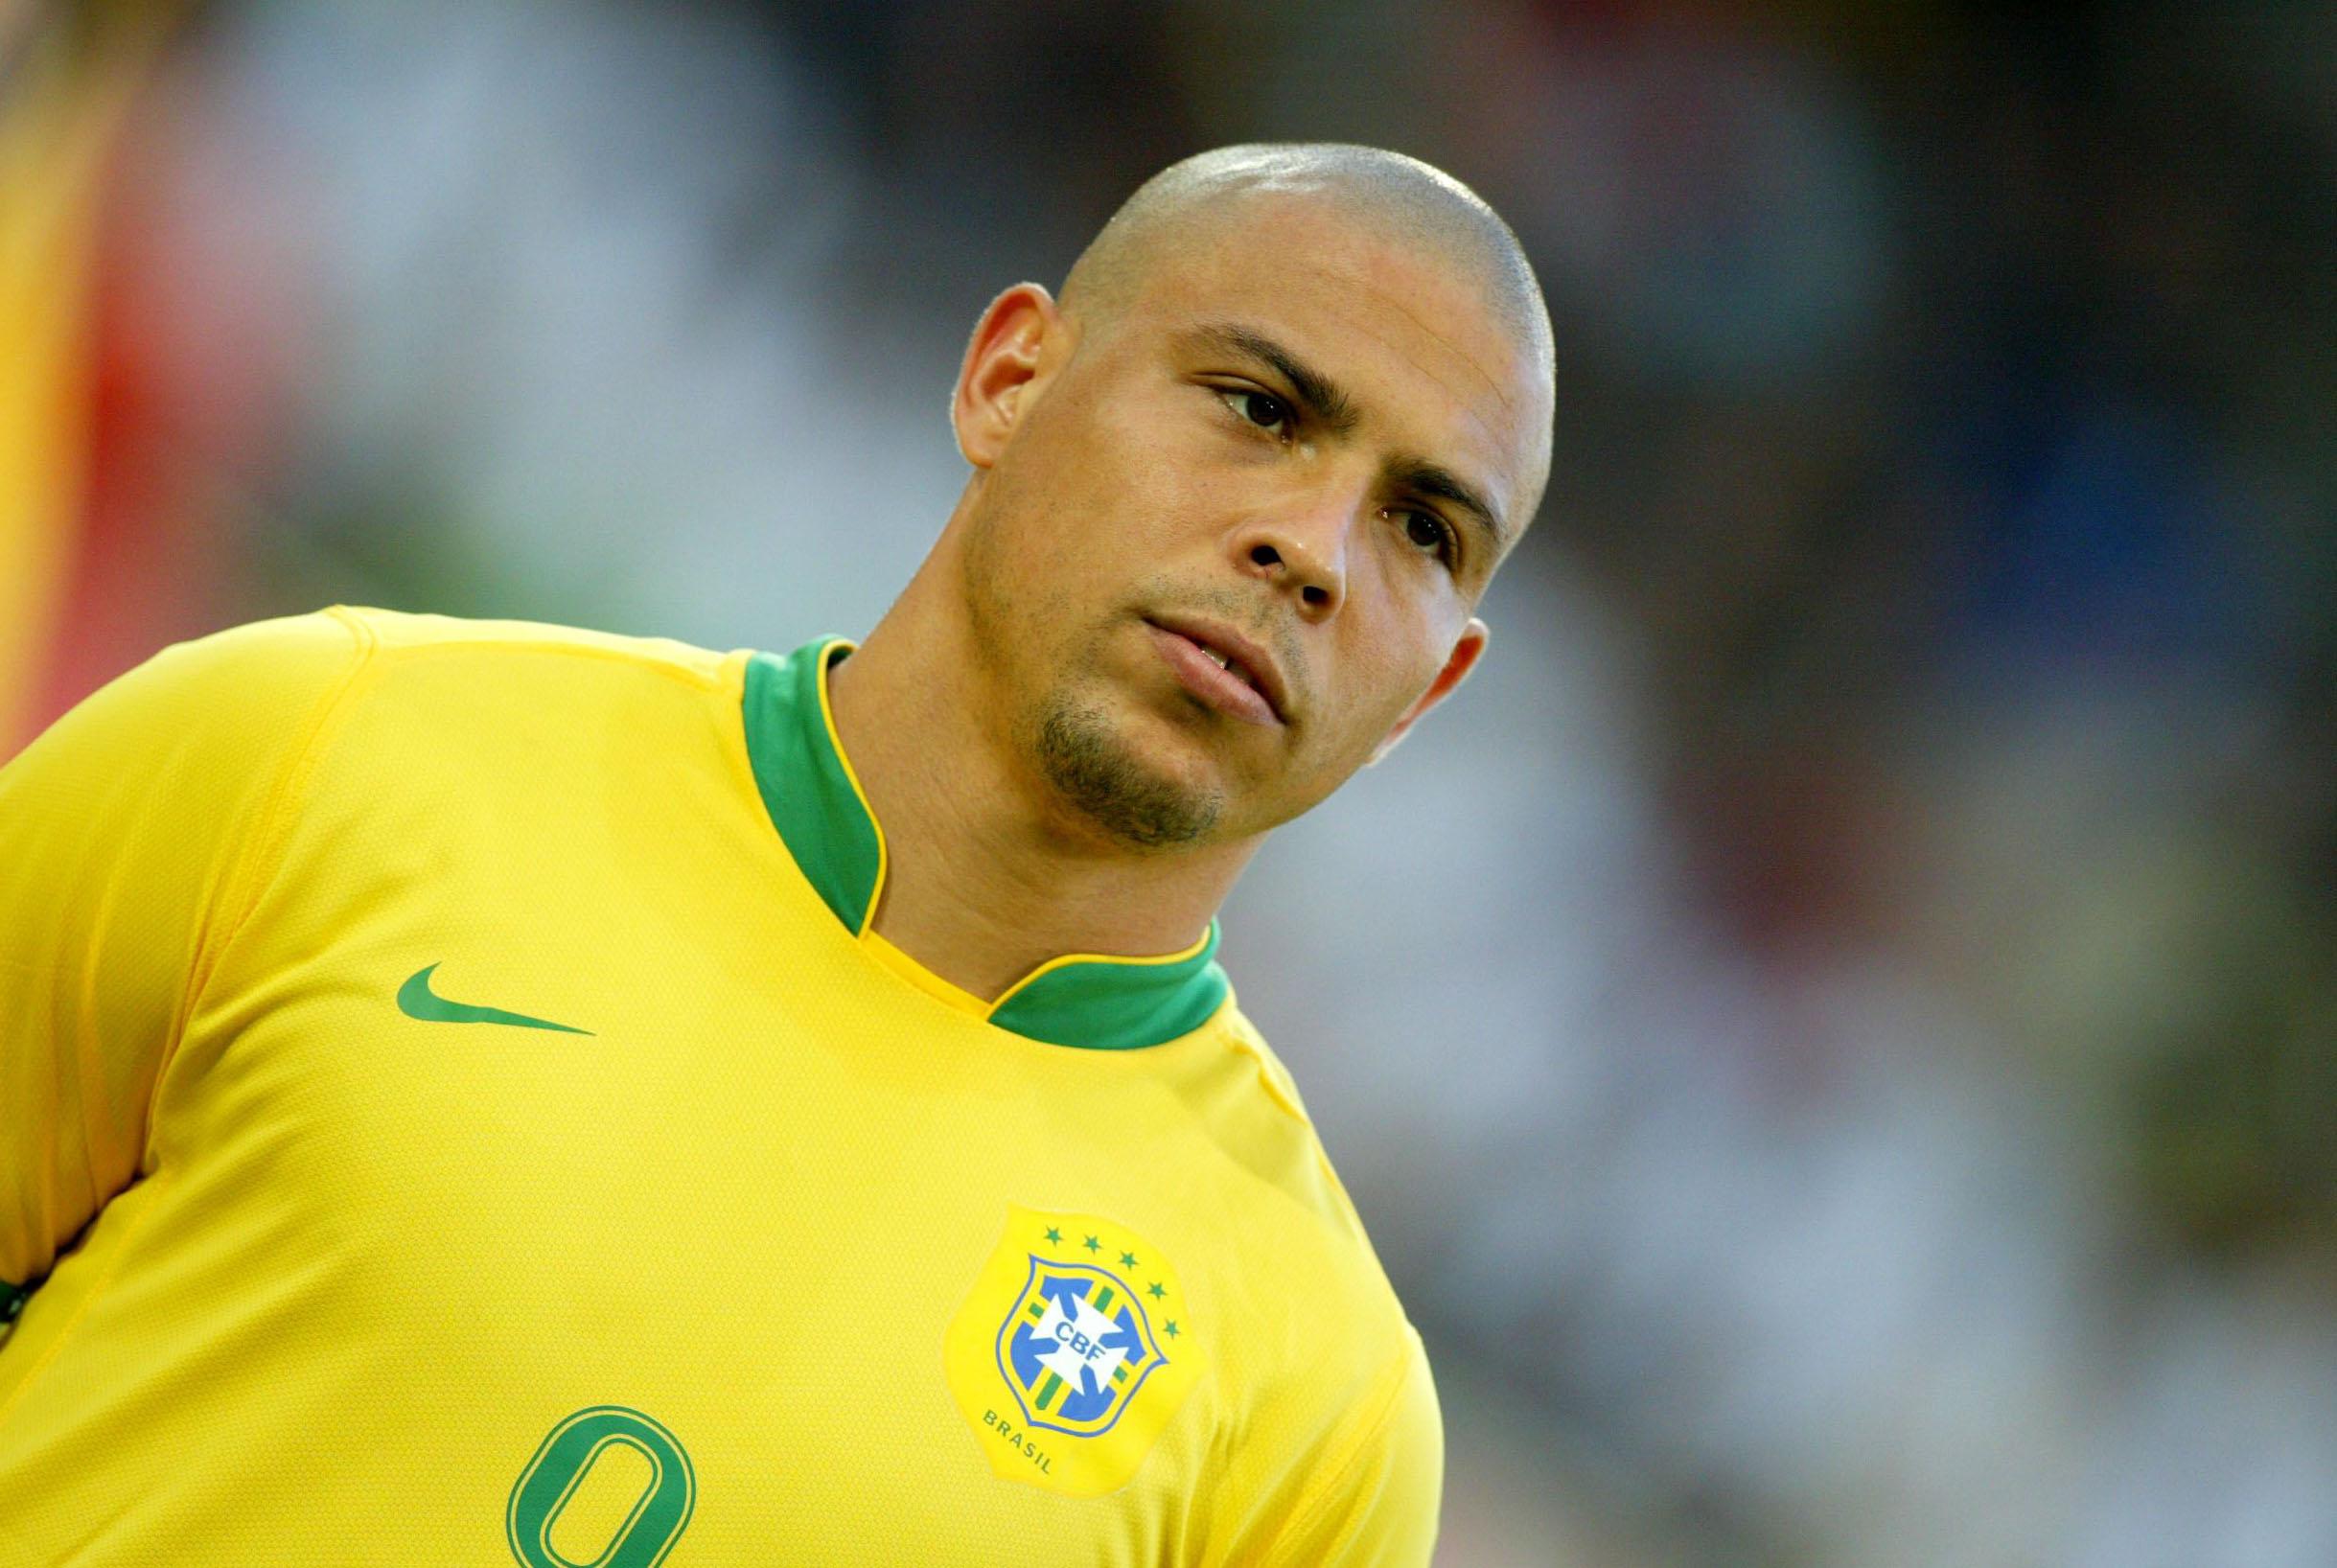 Ronaldo Nazario Net Worth